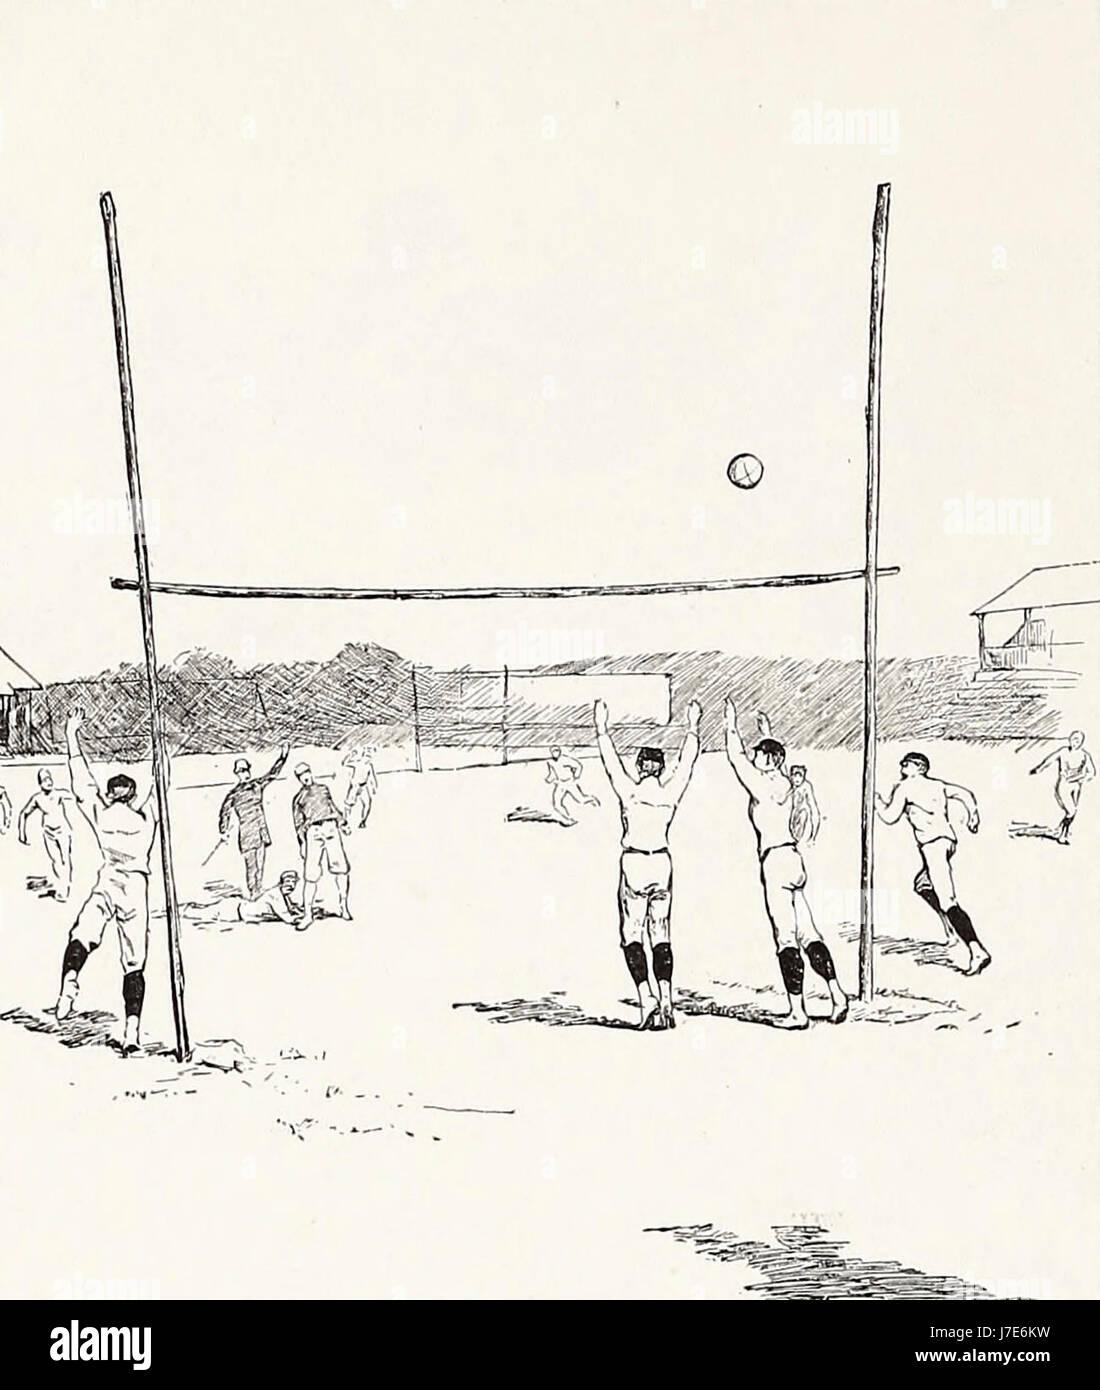 Un champ Objectif - Football américain, 1887 Photo Stock